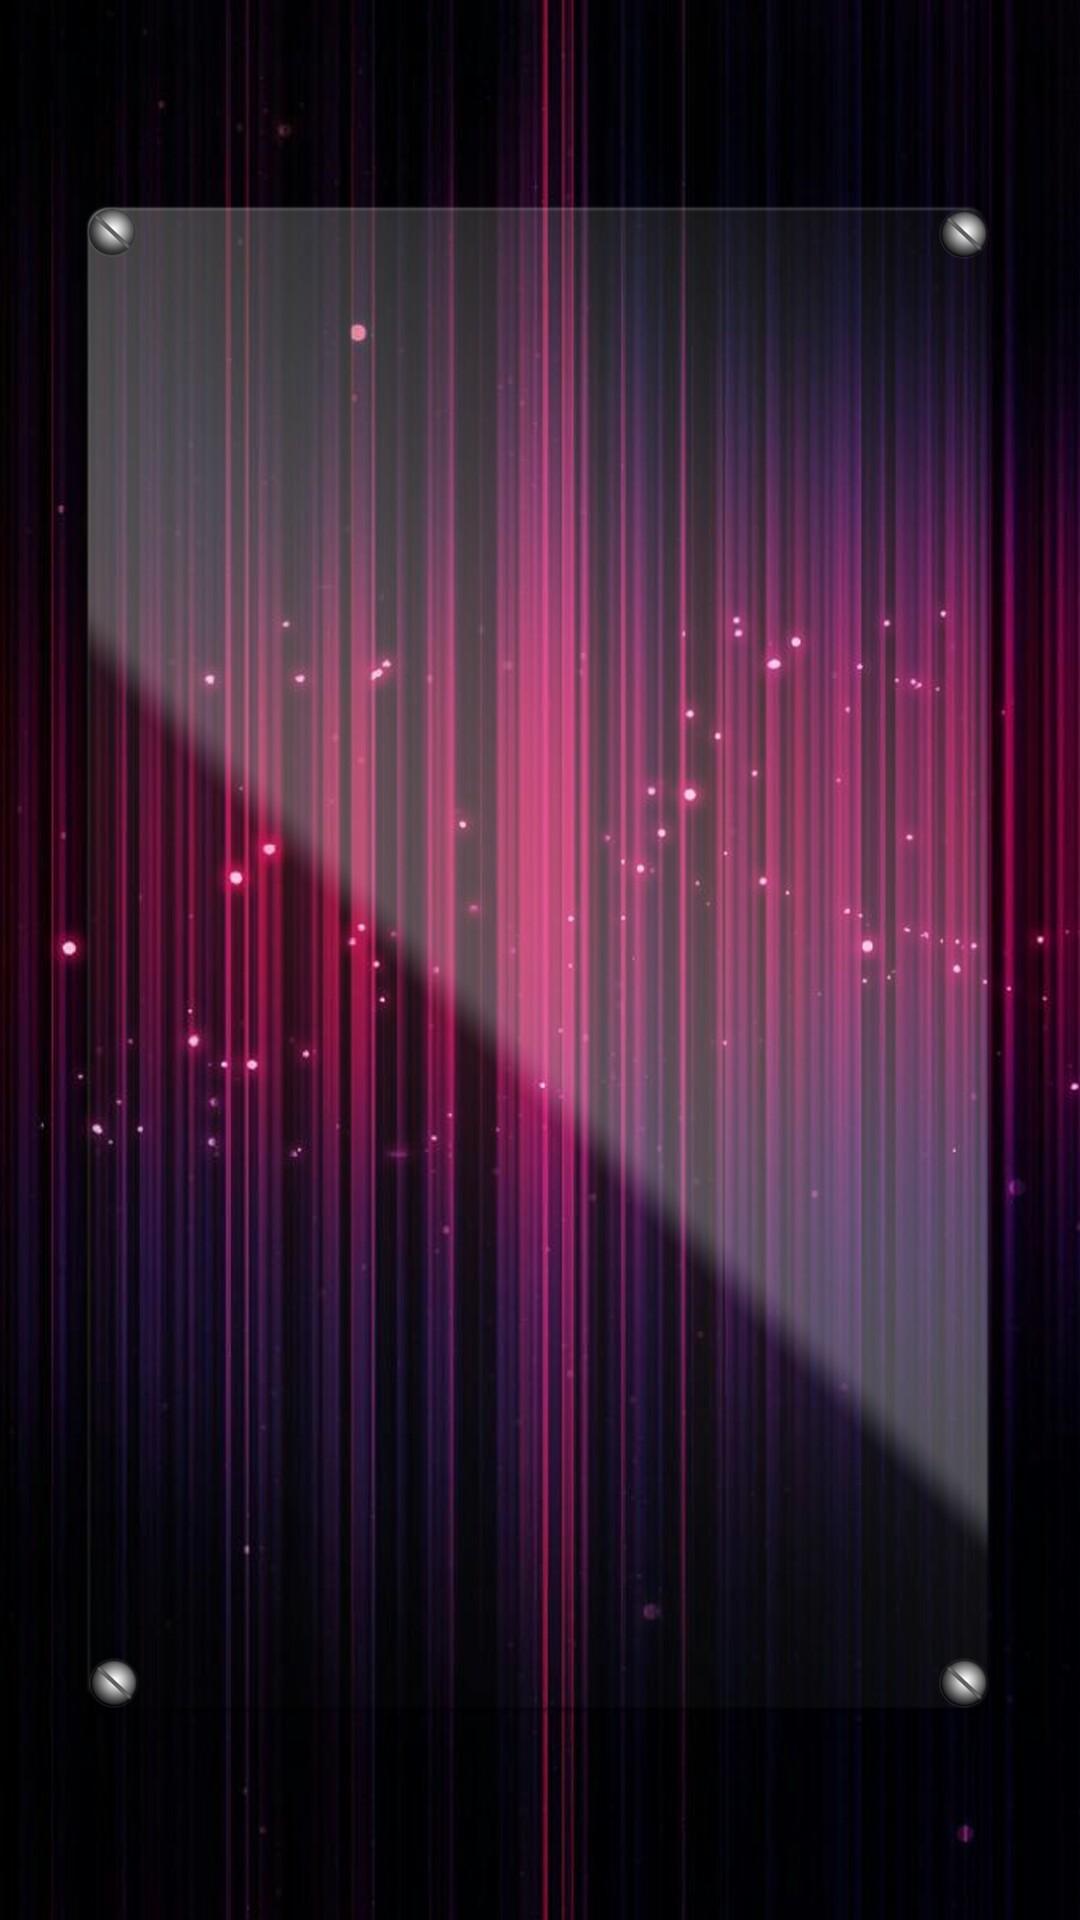 Pink and Purple Strobe Lights Wallpaper